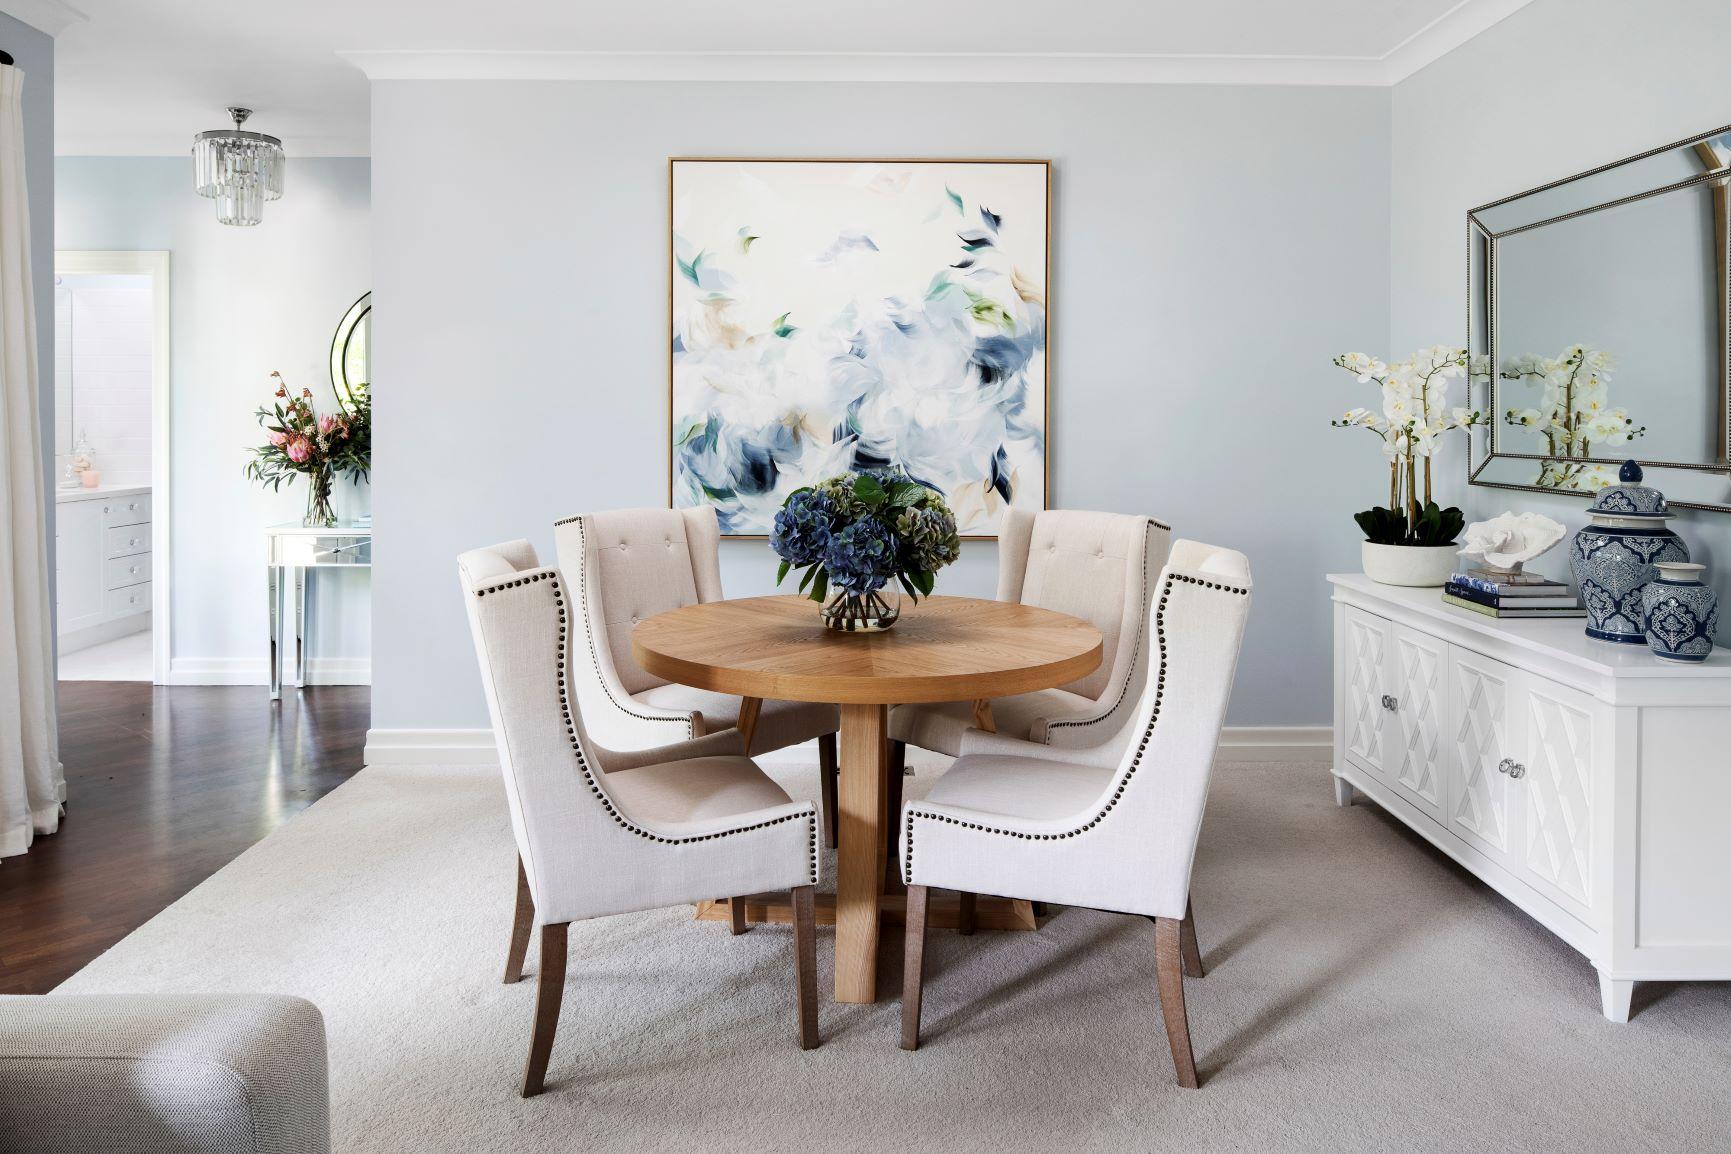 chris-carroll-tlc-interiors-classic-dining-room